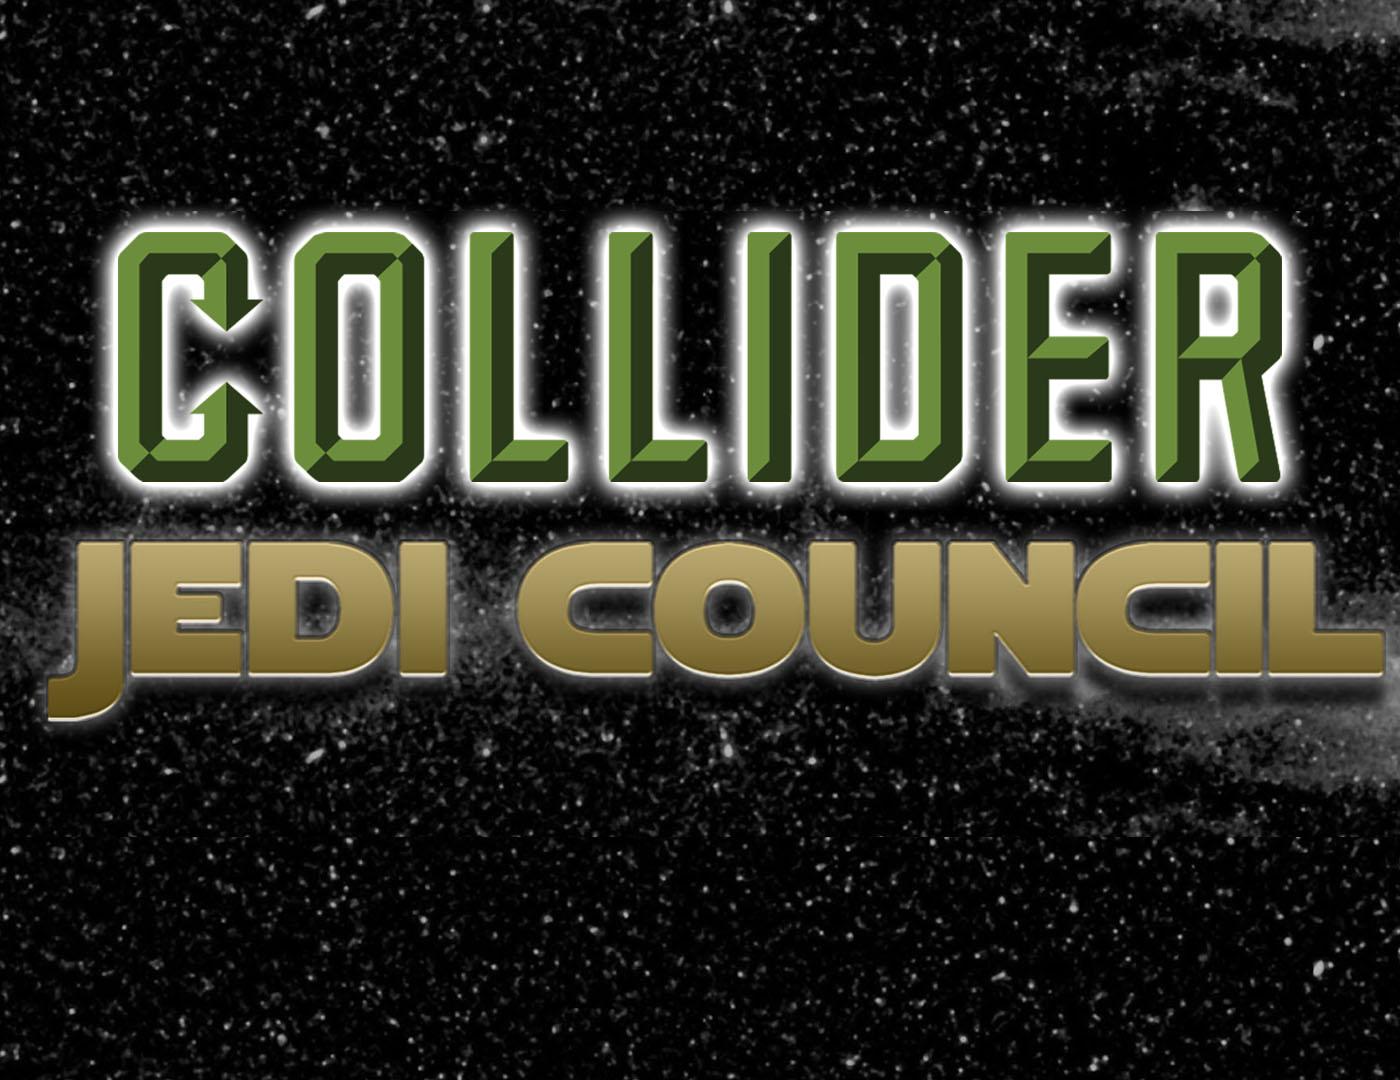 Who Will Luke Skywalker Battle In Star Wars Episode 8? - Collider Jedi Council